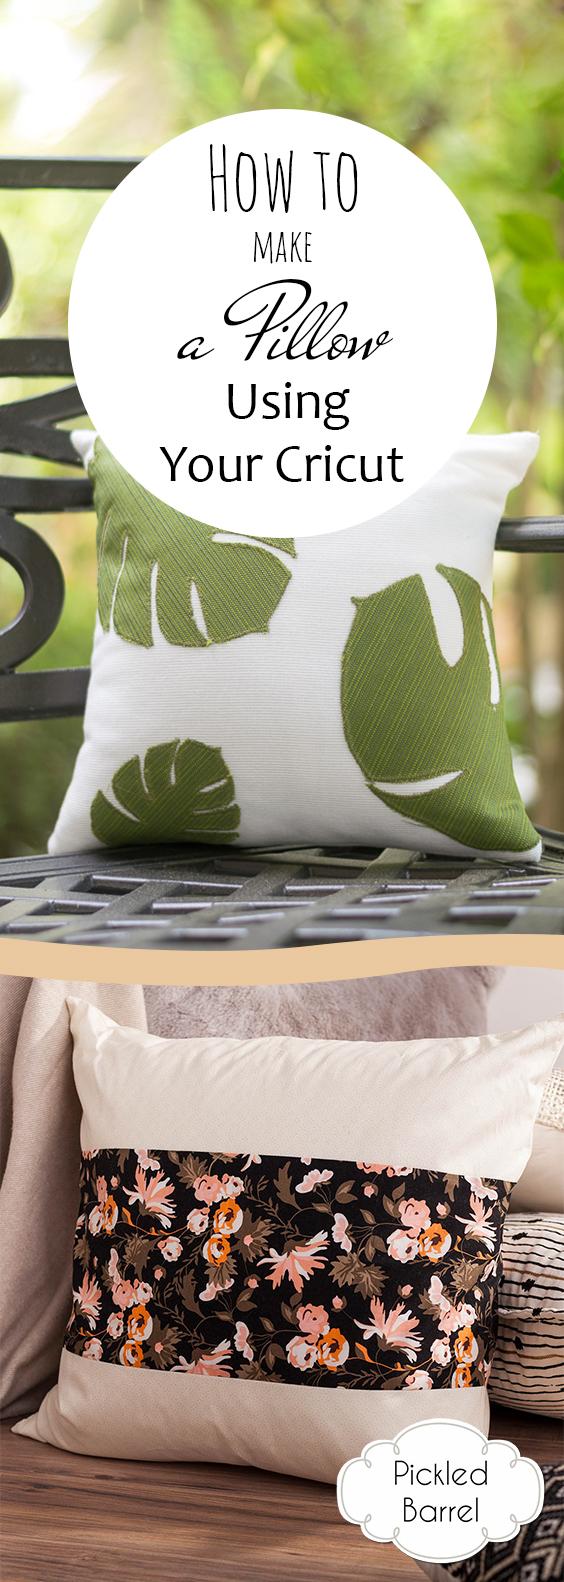 How to Make a Pillow Using Your Cricut| Cricut Pillows, Cricut Pillow Projects, Cricut Pillow Projects, Cricut Crafts, Pillow Crafts, Pillow Projects. #CricutPillow #CricutCrafts #CricutPillowCrafts #SewingProjects